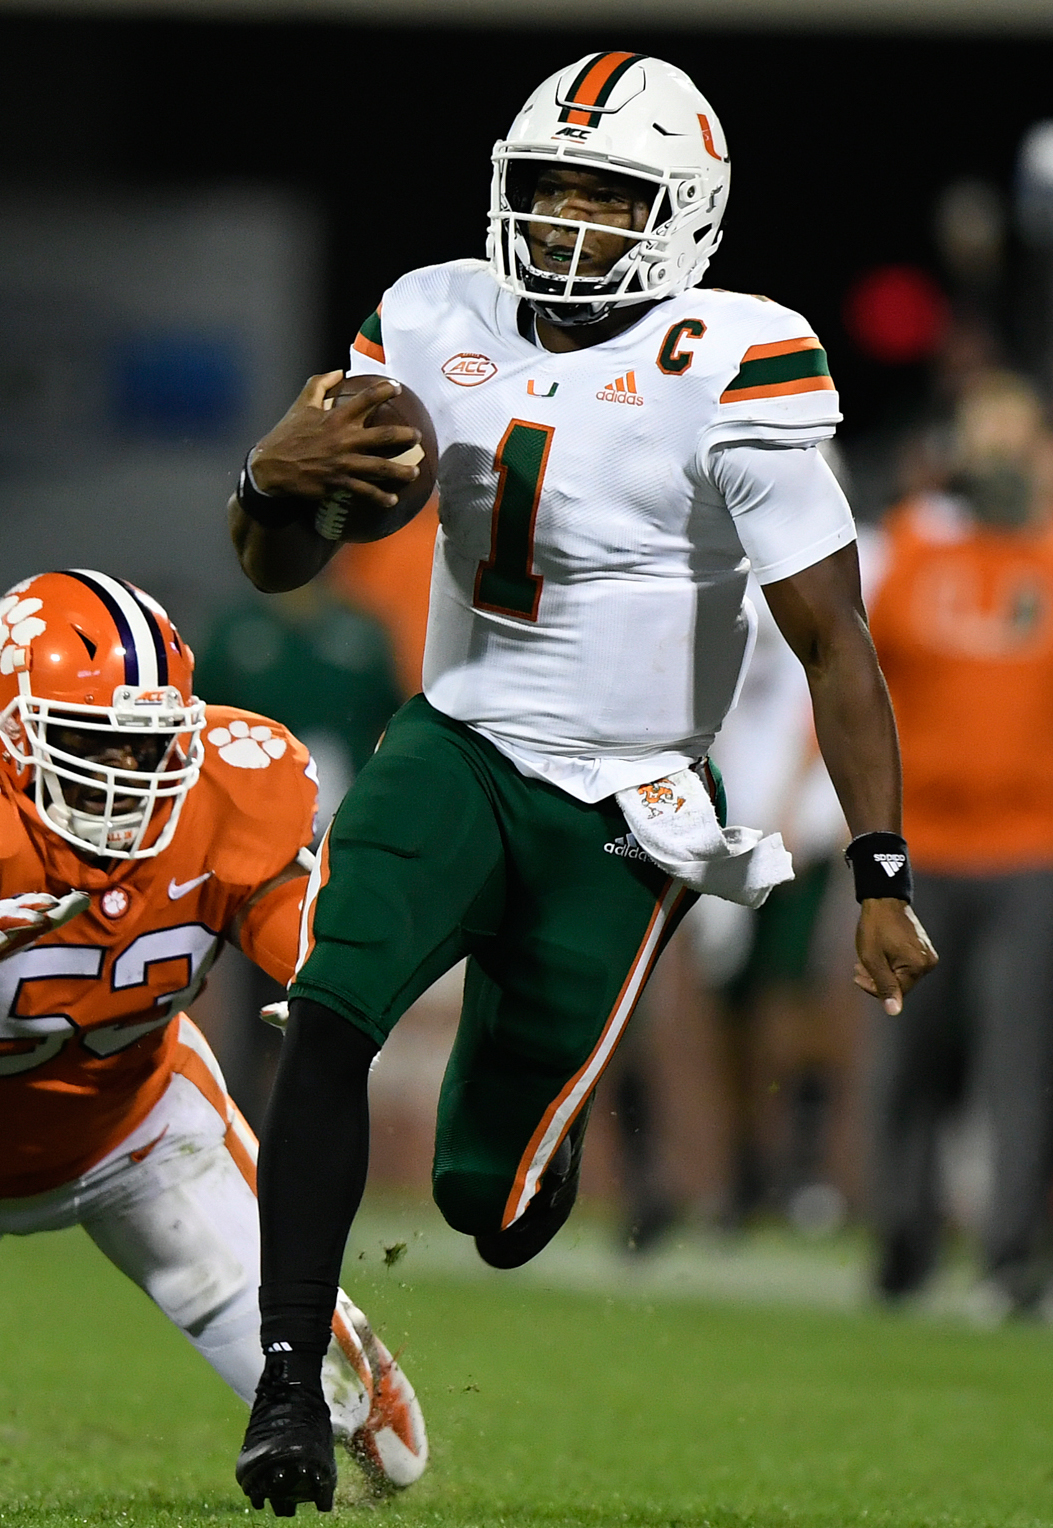 SportsTips' College Football Best Bets for Week 11